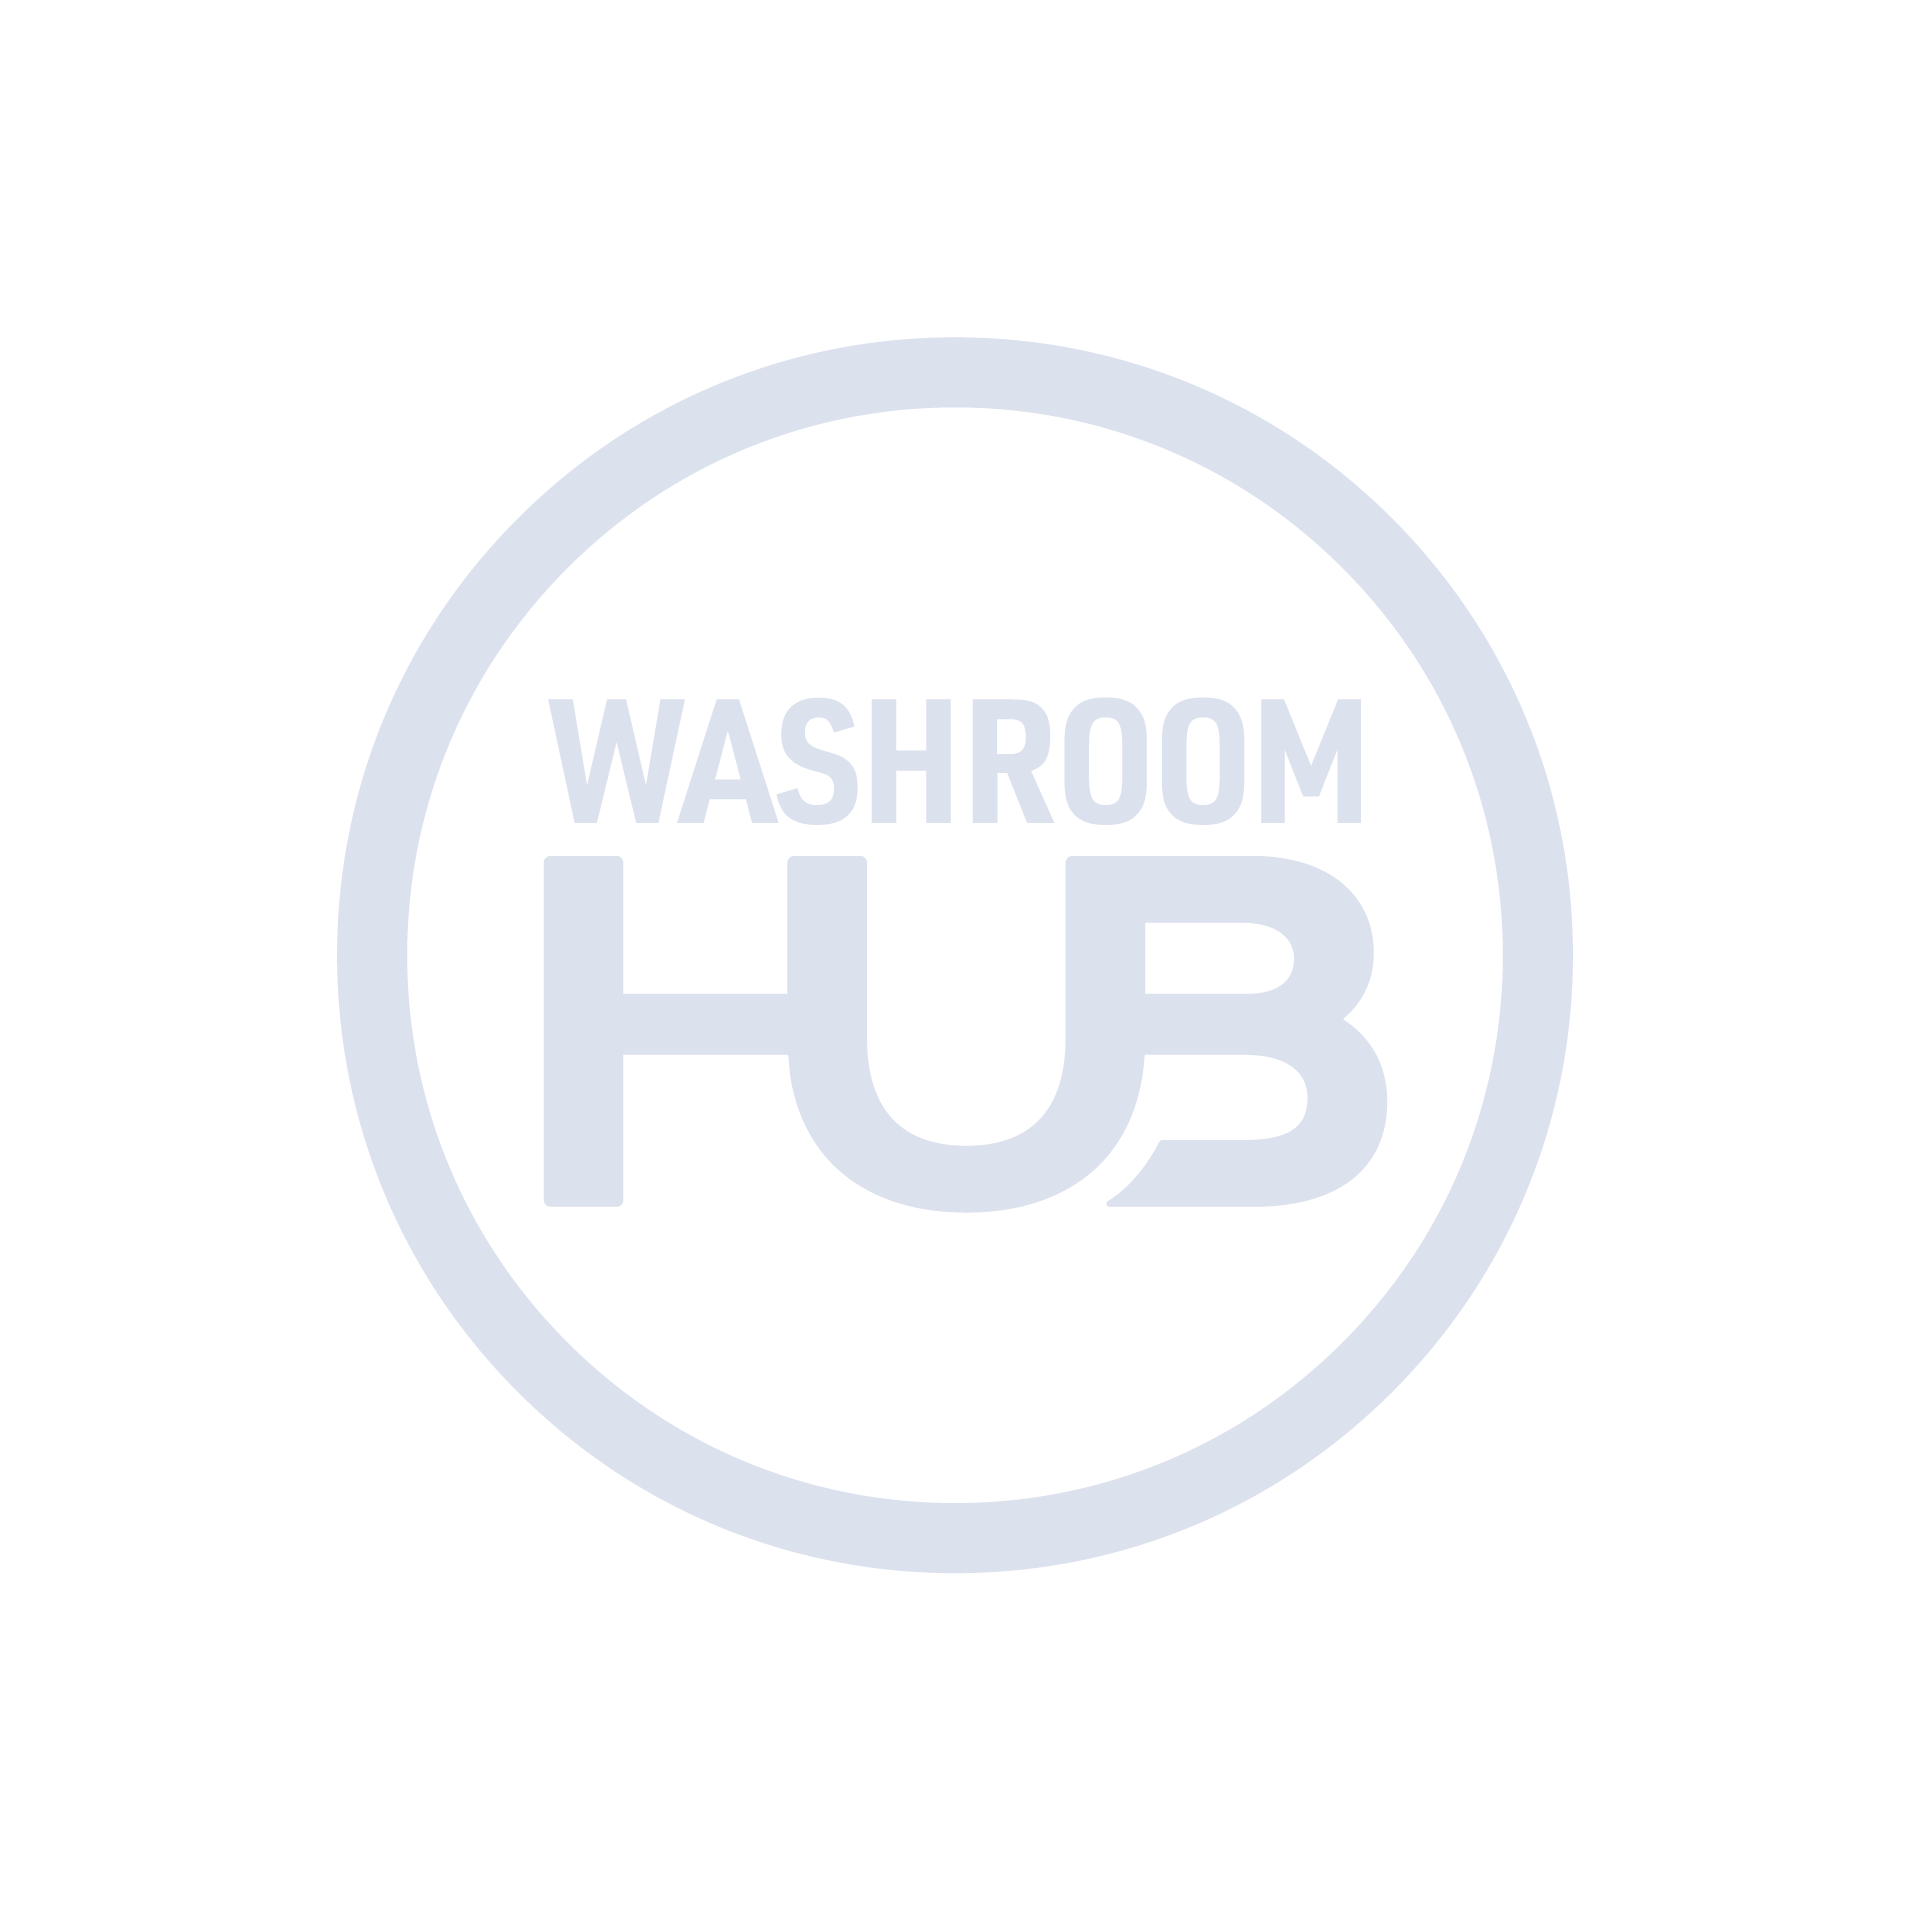 Biodrier Business Blade Hand Dryer | 0.85kW | High Speed Heat Recovery - Image1